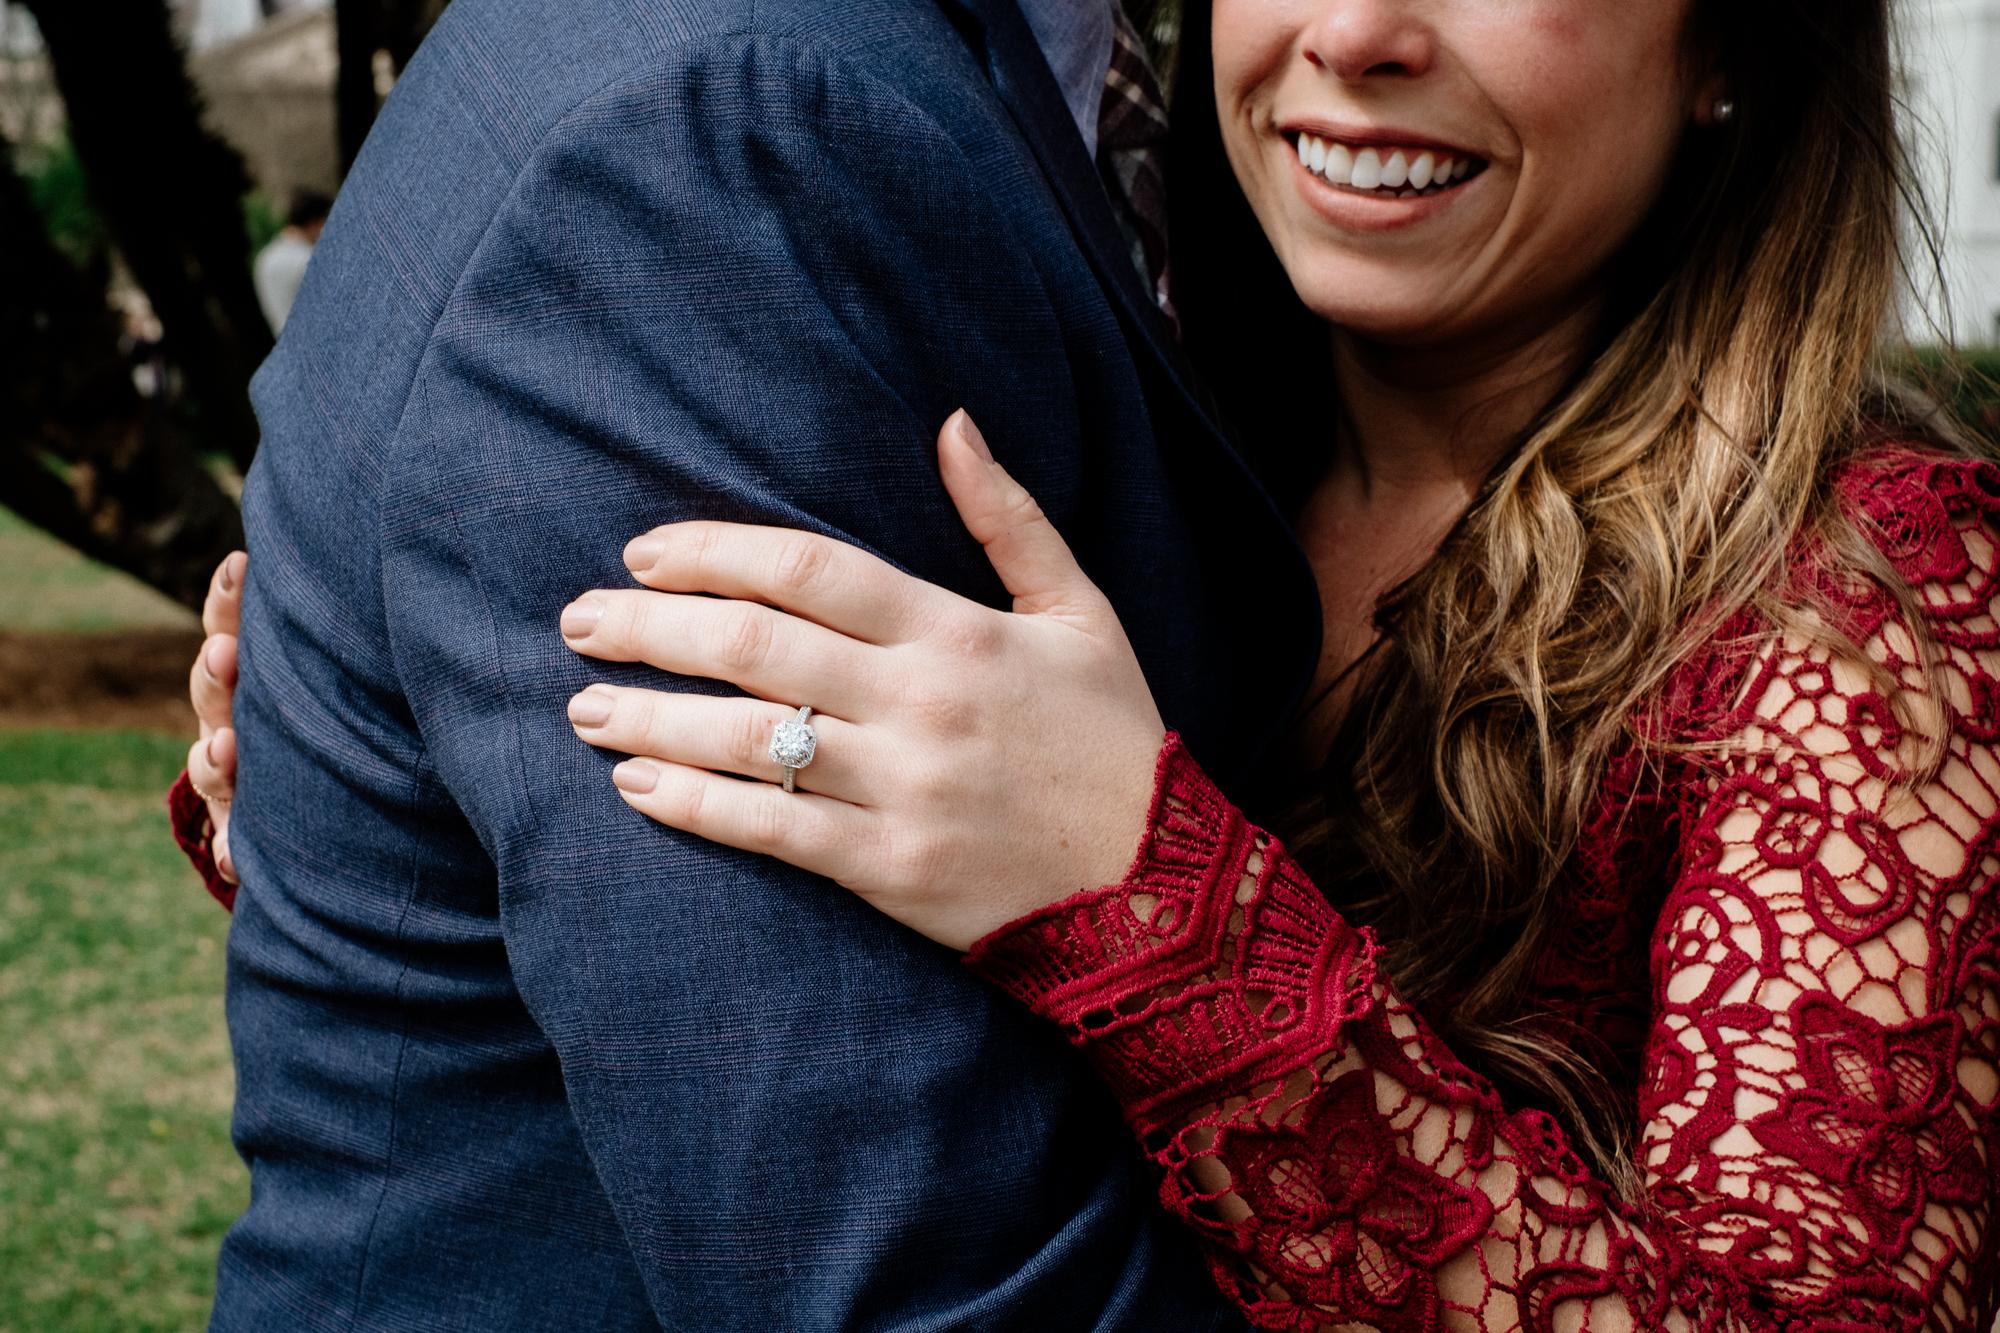 Jen_Montgomery_Photography_Angela_Brian_Engagement_Proposal_FB-44.jpg